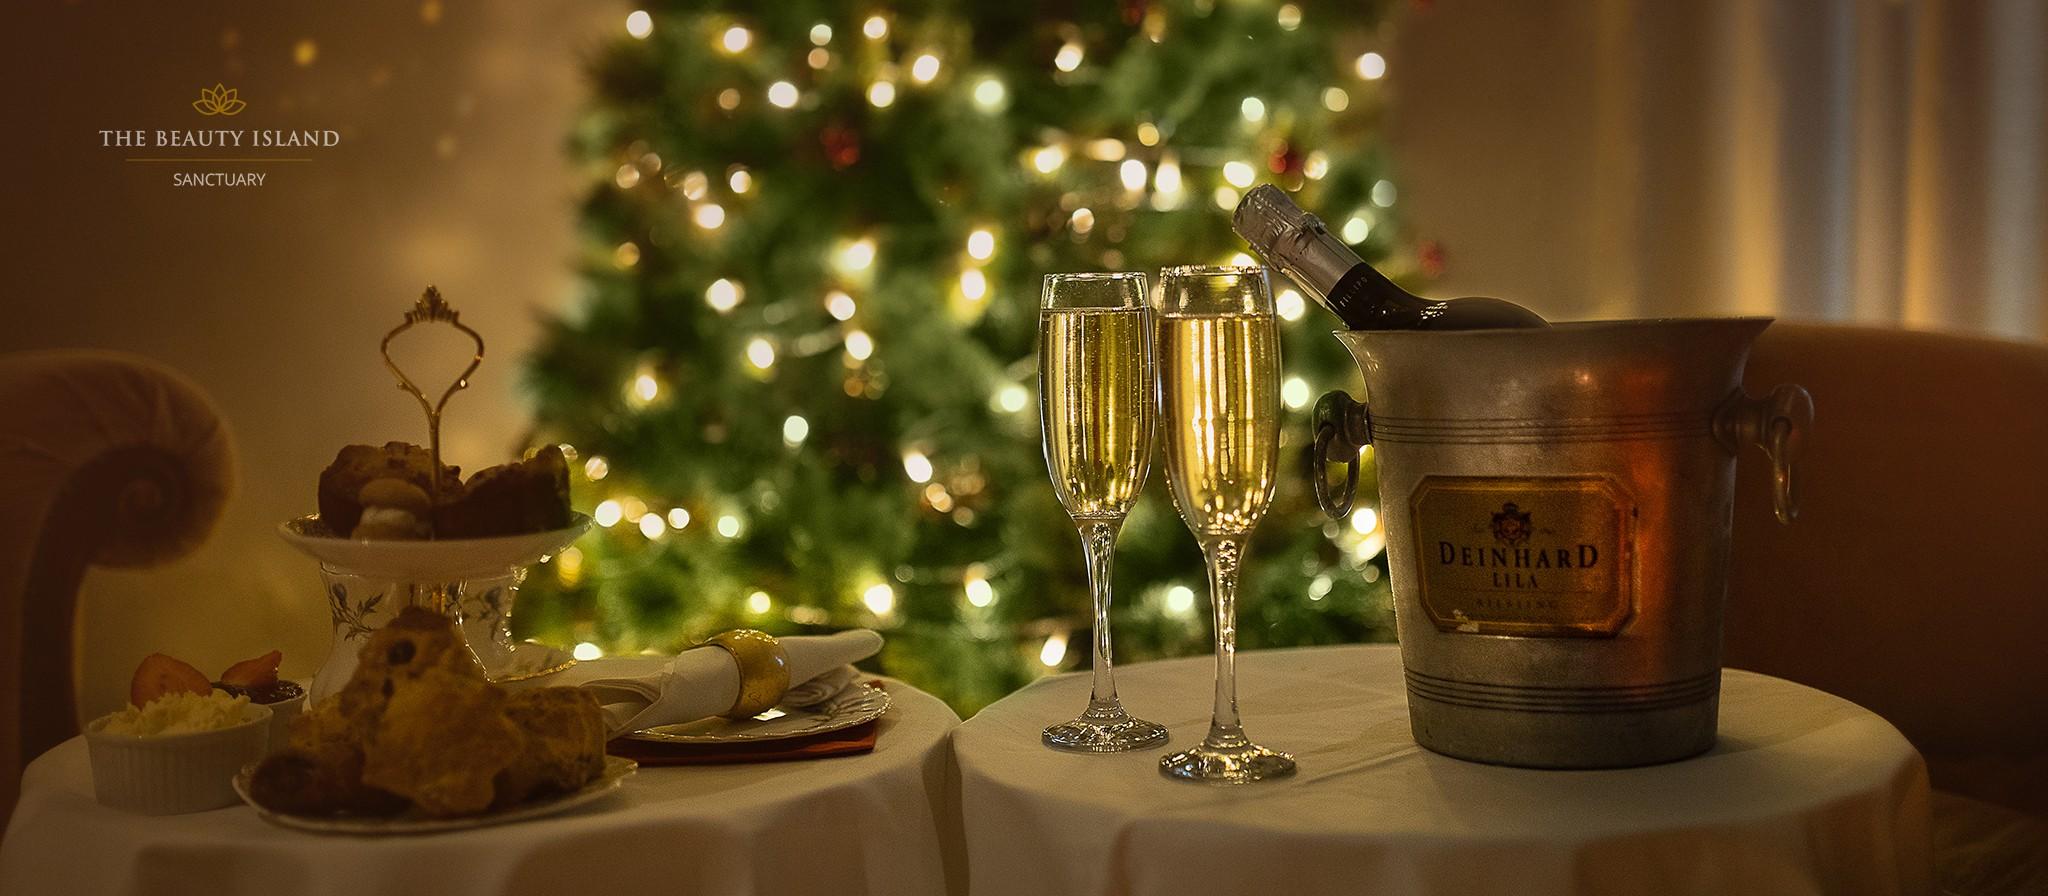 ChristmasTea TheBeautyIsland webiste longimage logoon8 1 - Festive Spa Afternoon Tea   Christmas Edition Only